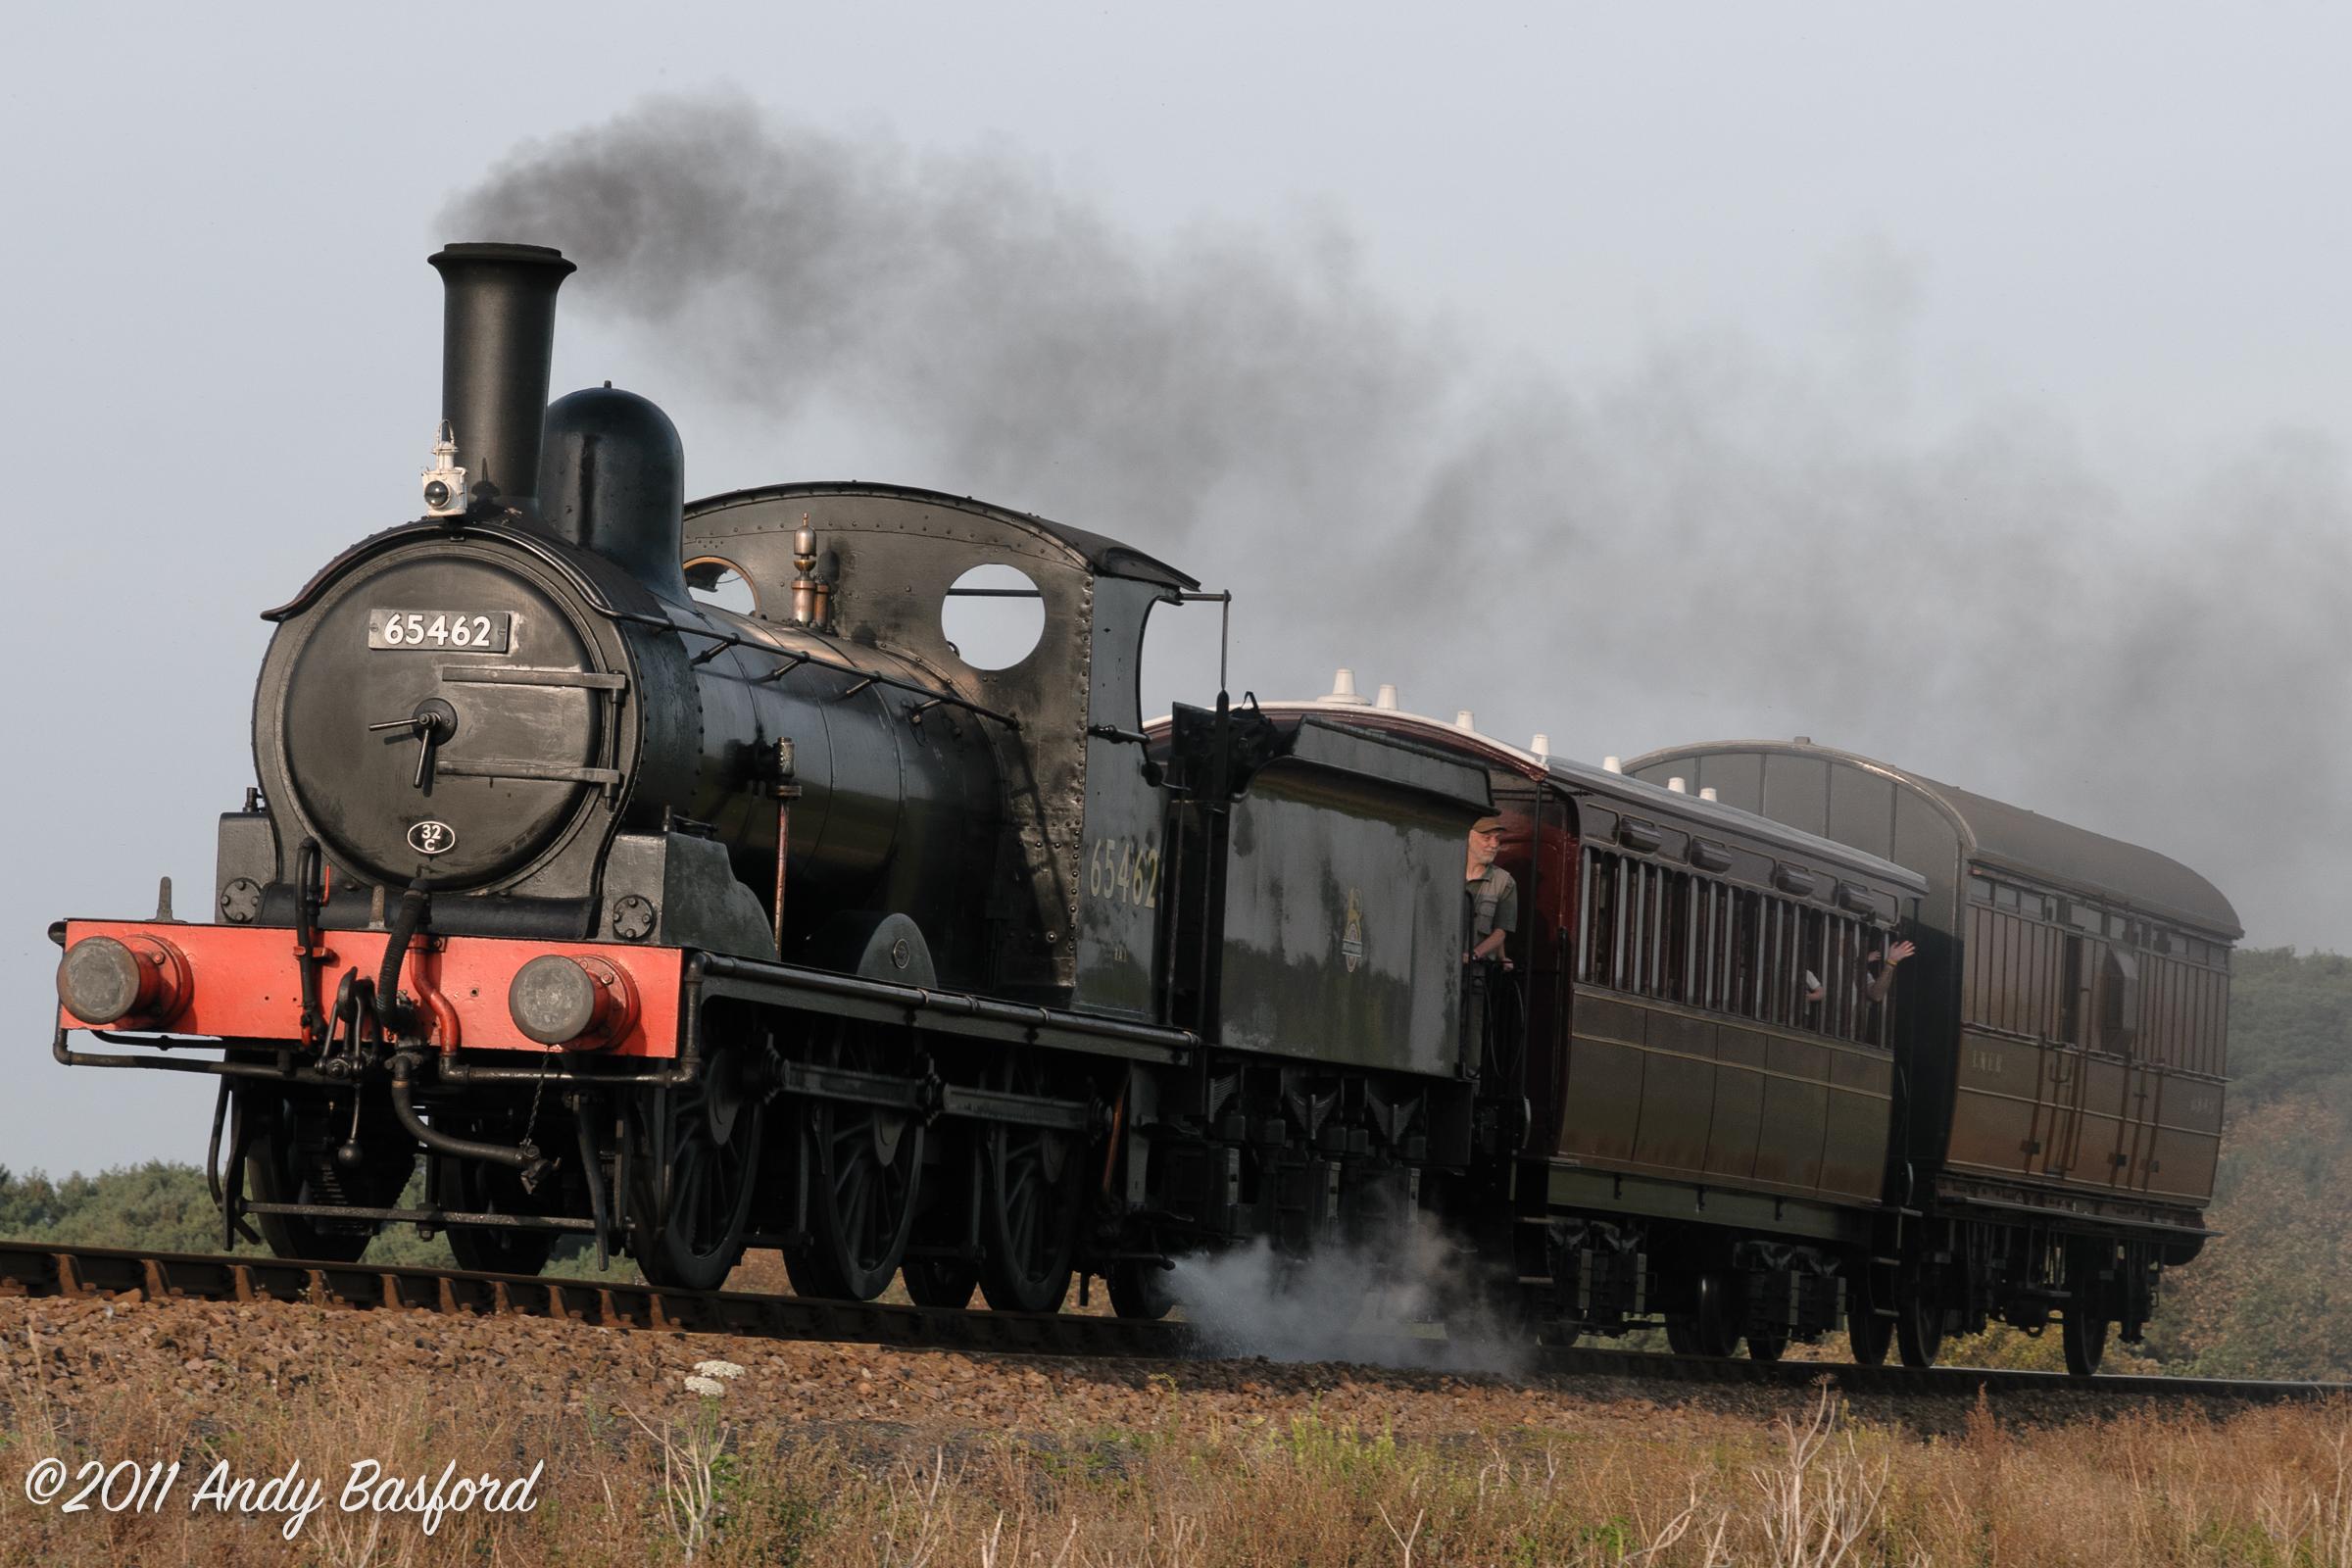 LNER class J15 0-6-0 65462-20111001